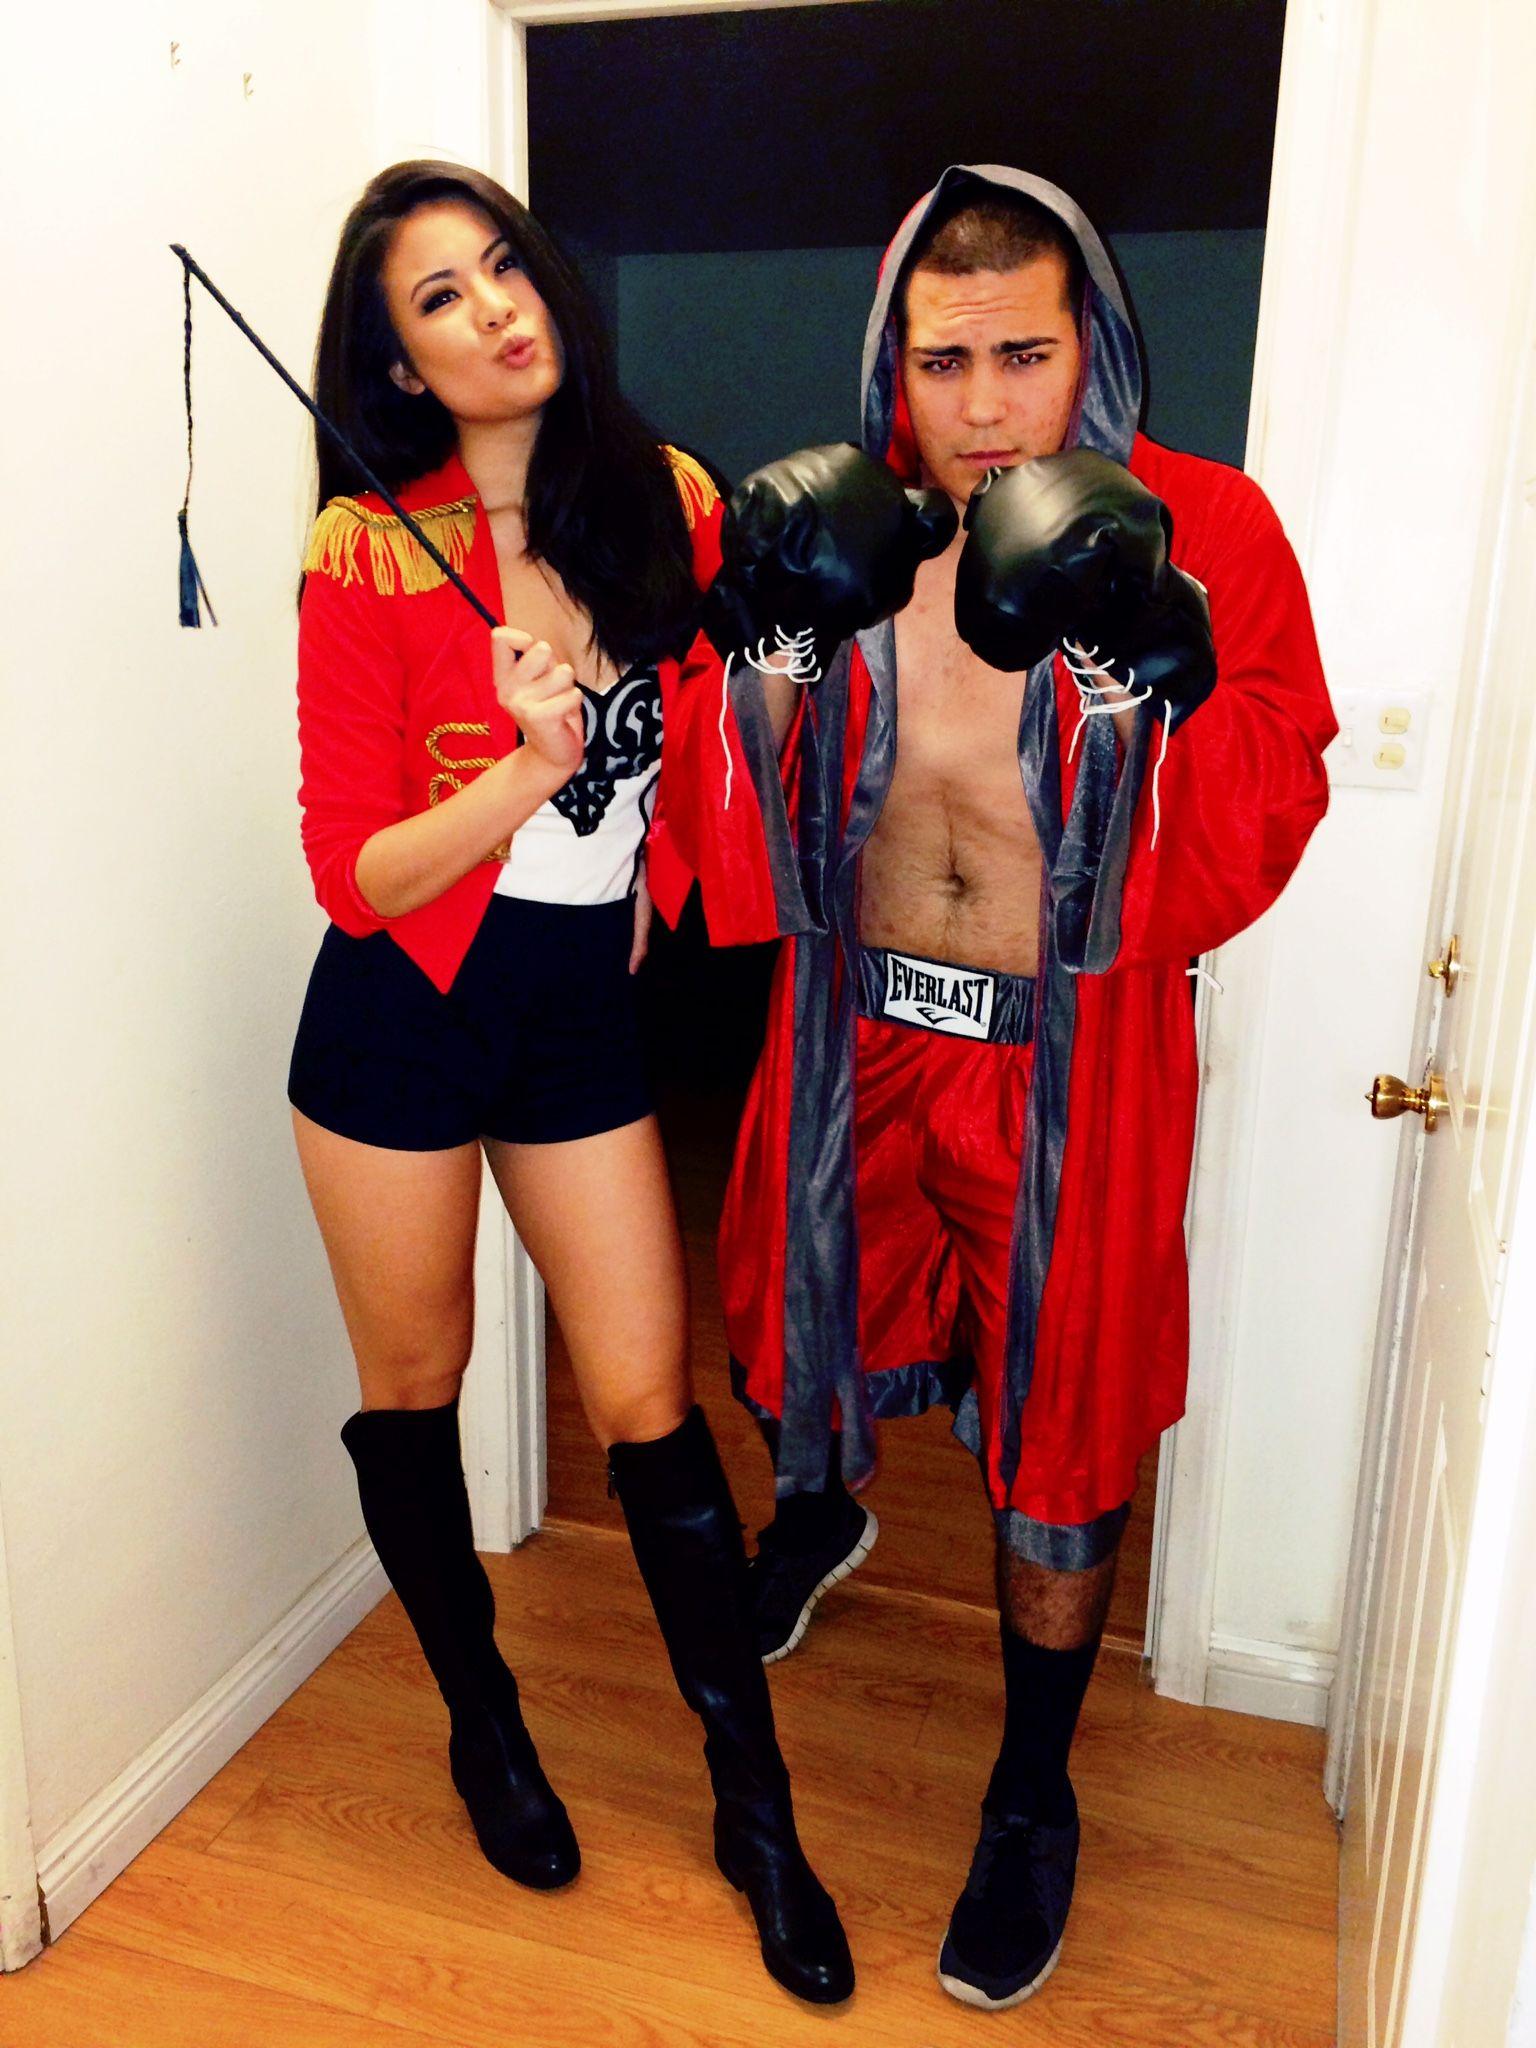 Halloween Costumes - Circus Ring Leader u0026 Boxer  sc 1 st  Pinterest & Halloween Costumes - Circus Ring Leader u0026 Boxer | My DIYs u0026 Crafts ...